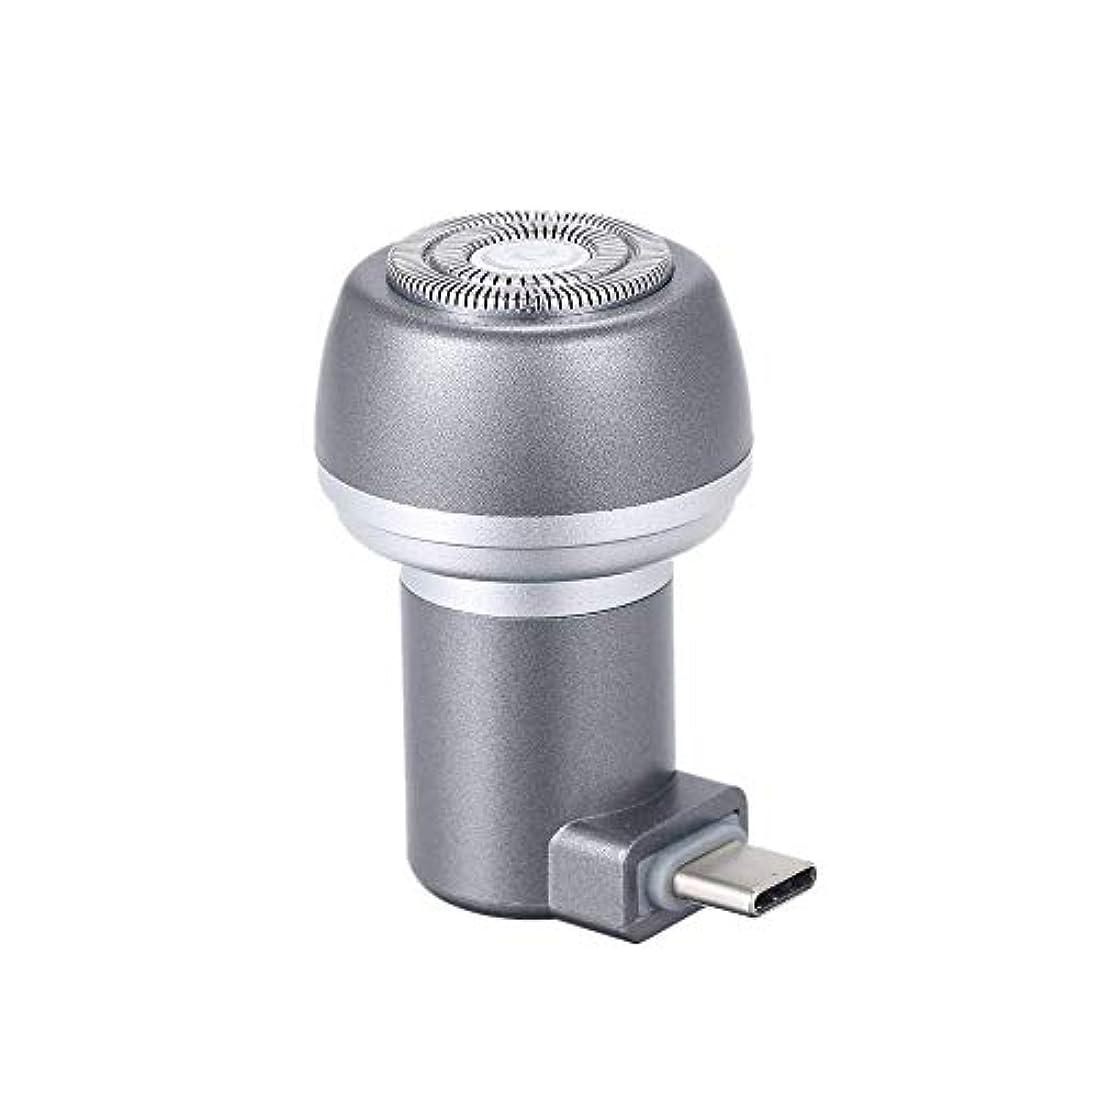 XiAnShiYu家庭用 電気 シェーバー 男性用 防水 ウェットドライシェービング USB充電式 グレー タイプC